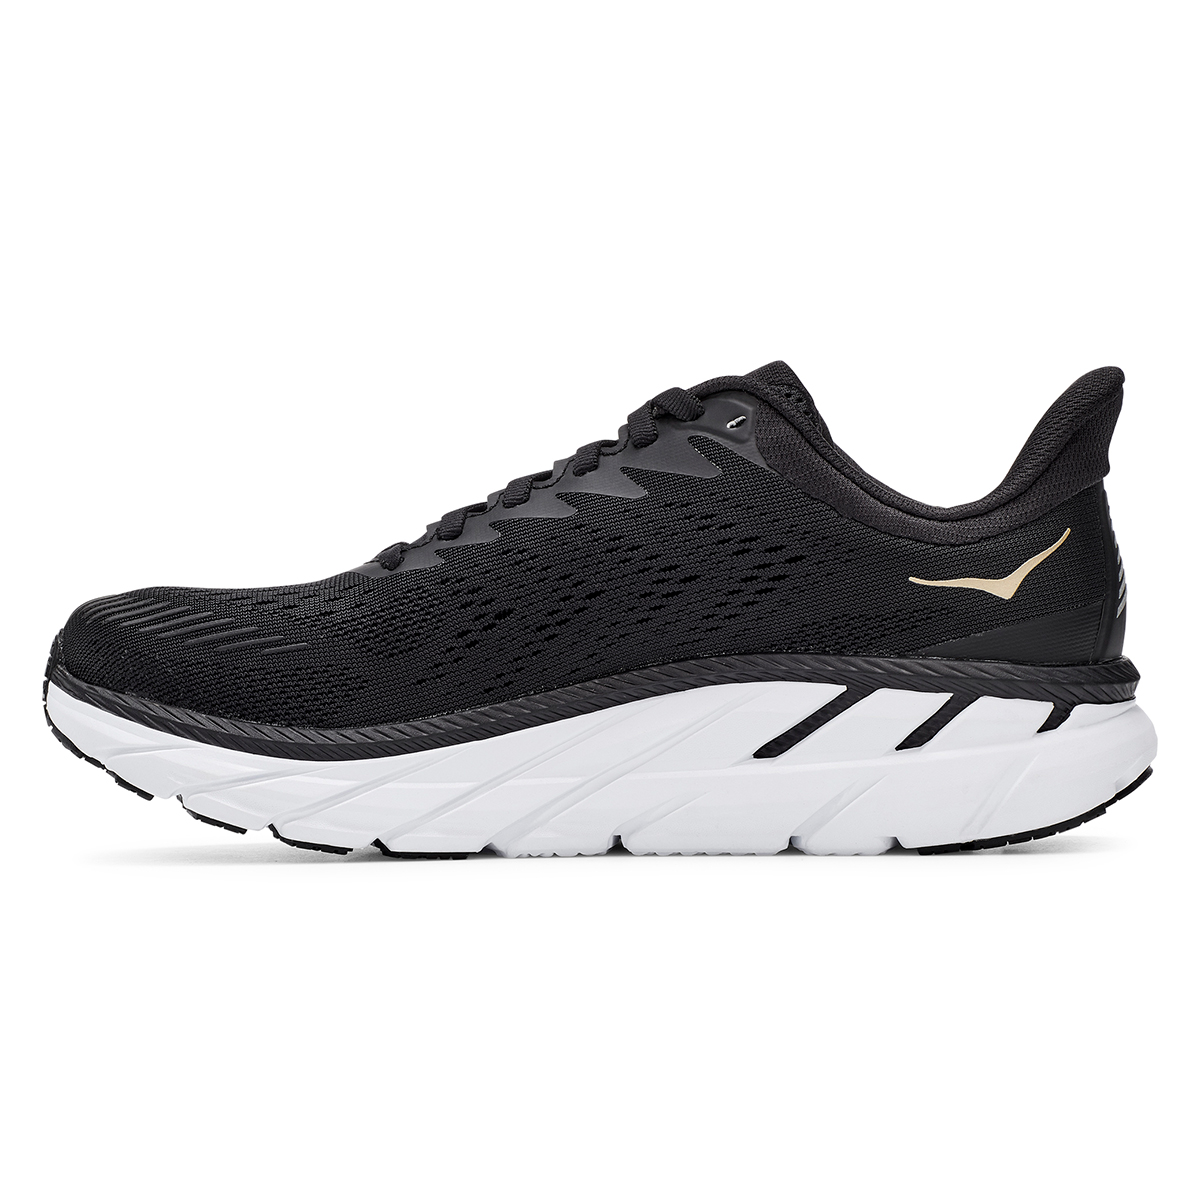 Women's Hoka One One Clifton 7 Running Shoe - Color: Black/Bronze - Size: 5 - Width: Regular, Black/Bronze, large, image 6